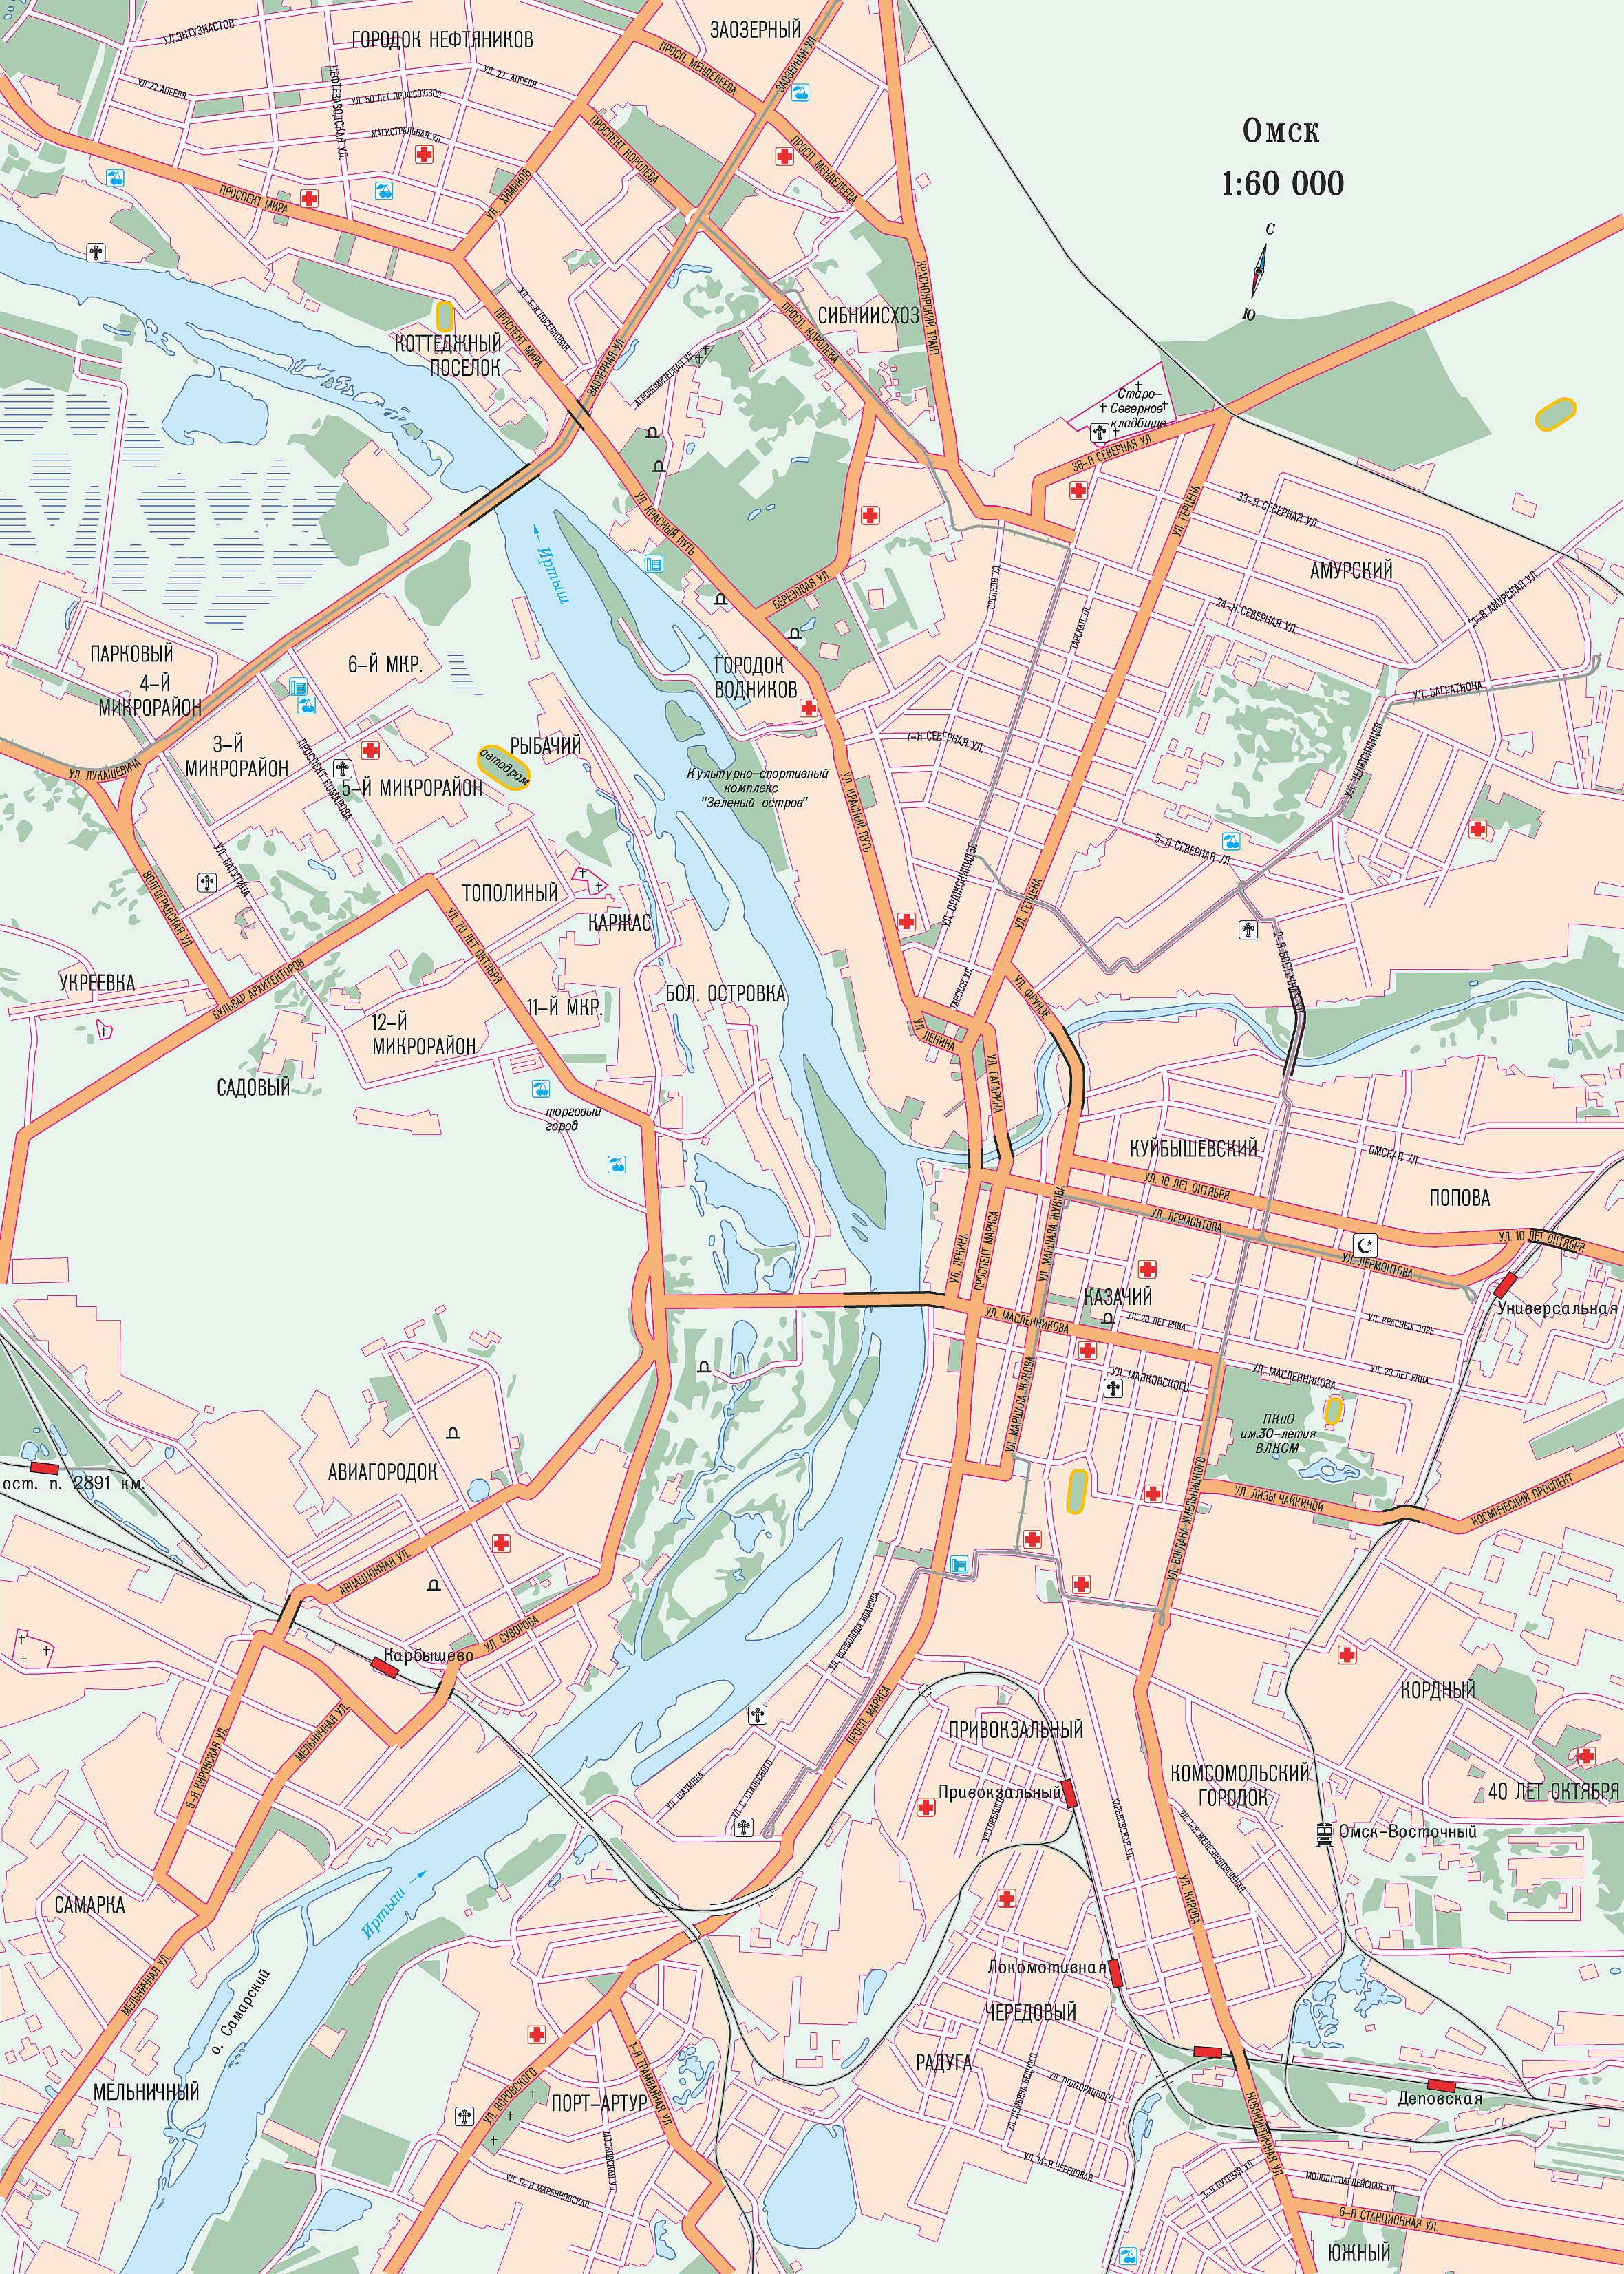 Схема улиц и домов в омске